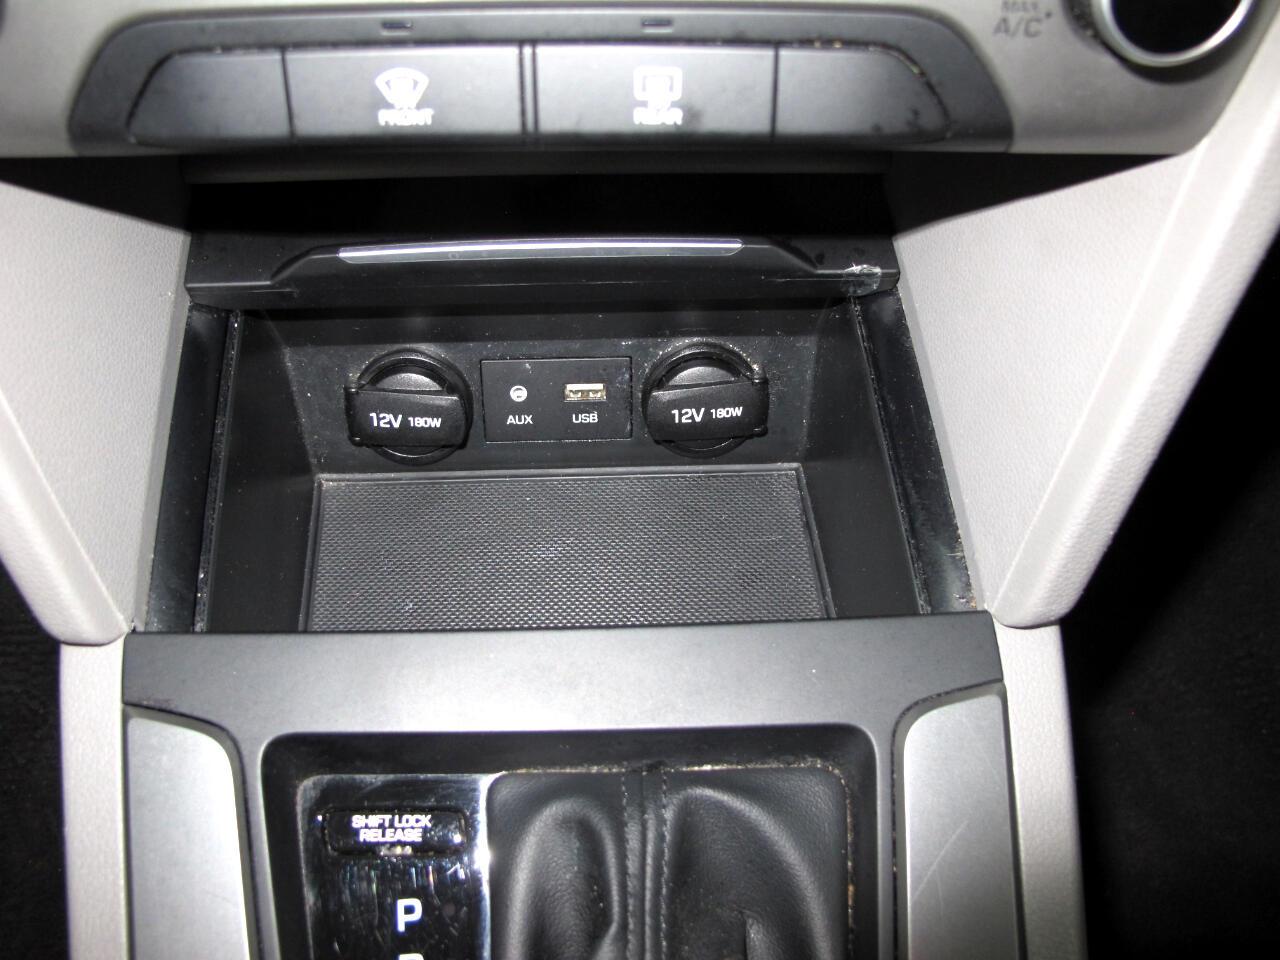 2018 Hyundai Elantra SEL 2.0L Auto (Alabama)